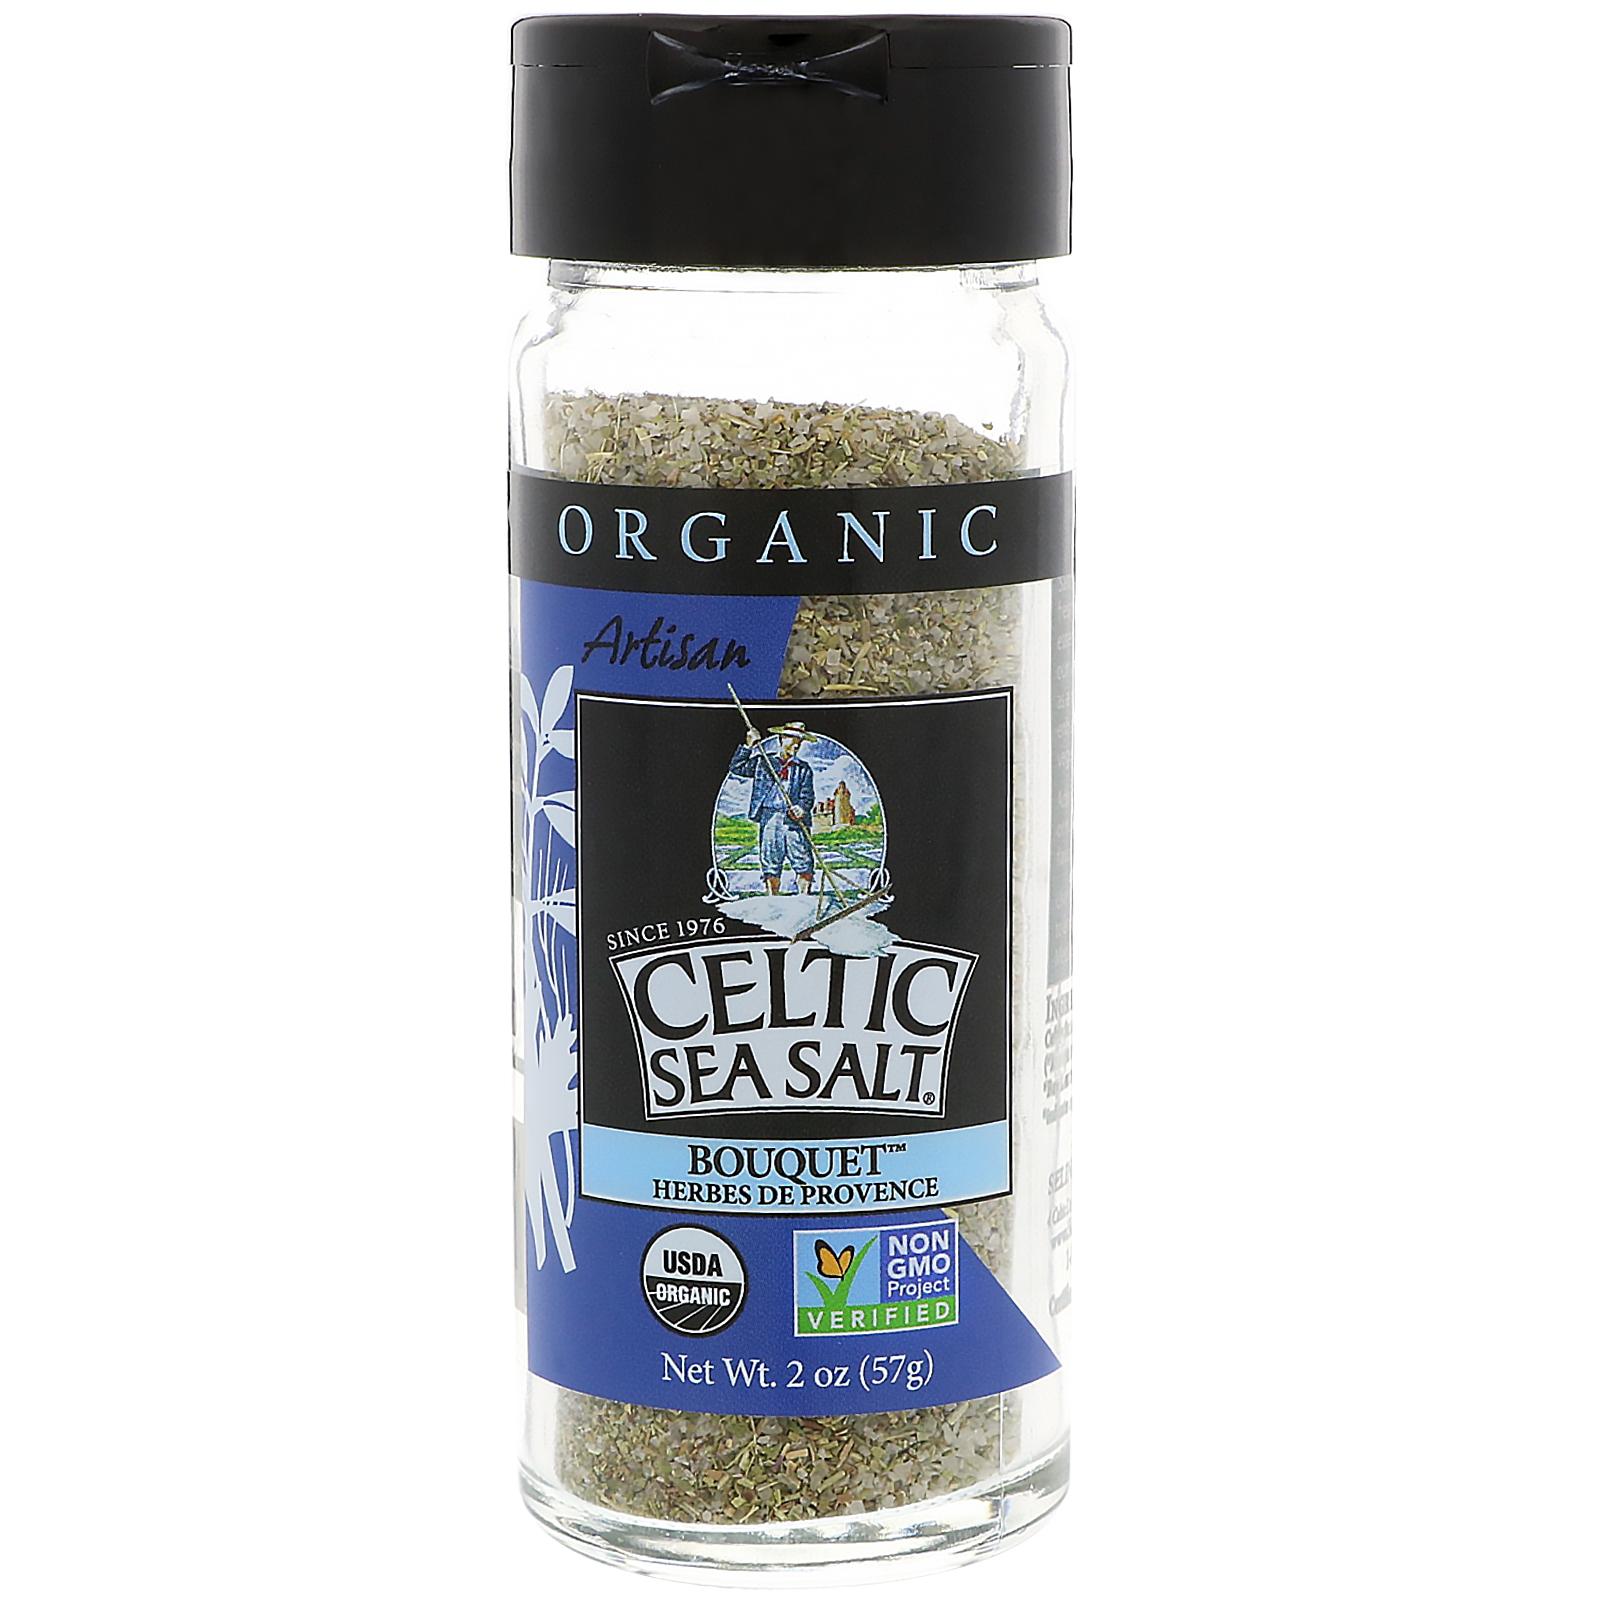 Celtic Sea Salt, Organic, Artisan, Bouquet Herbes De